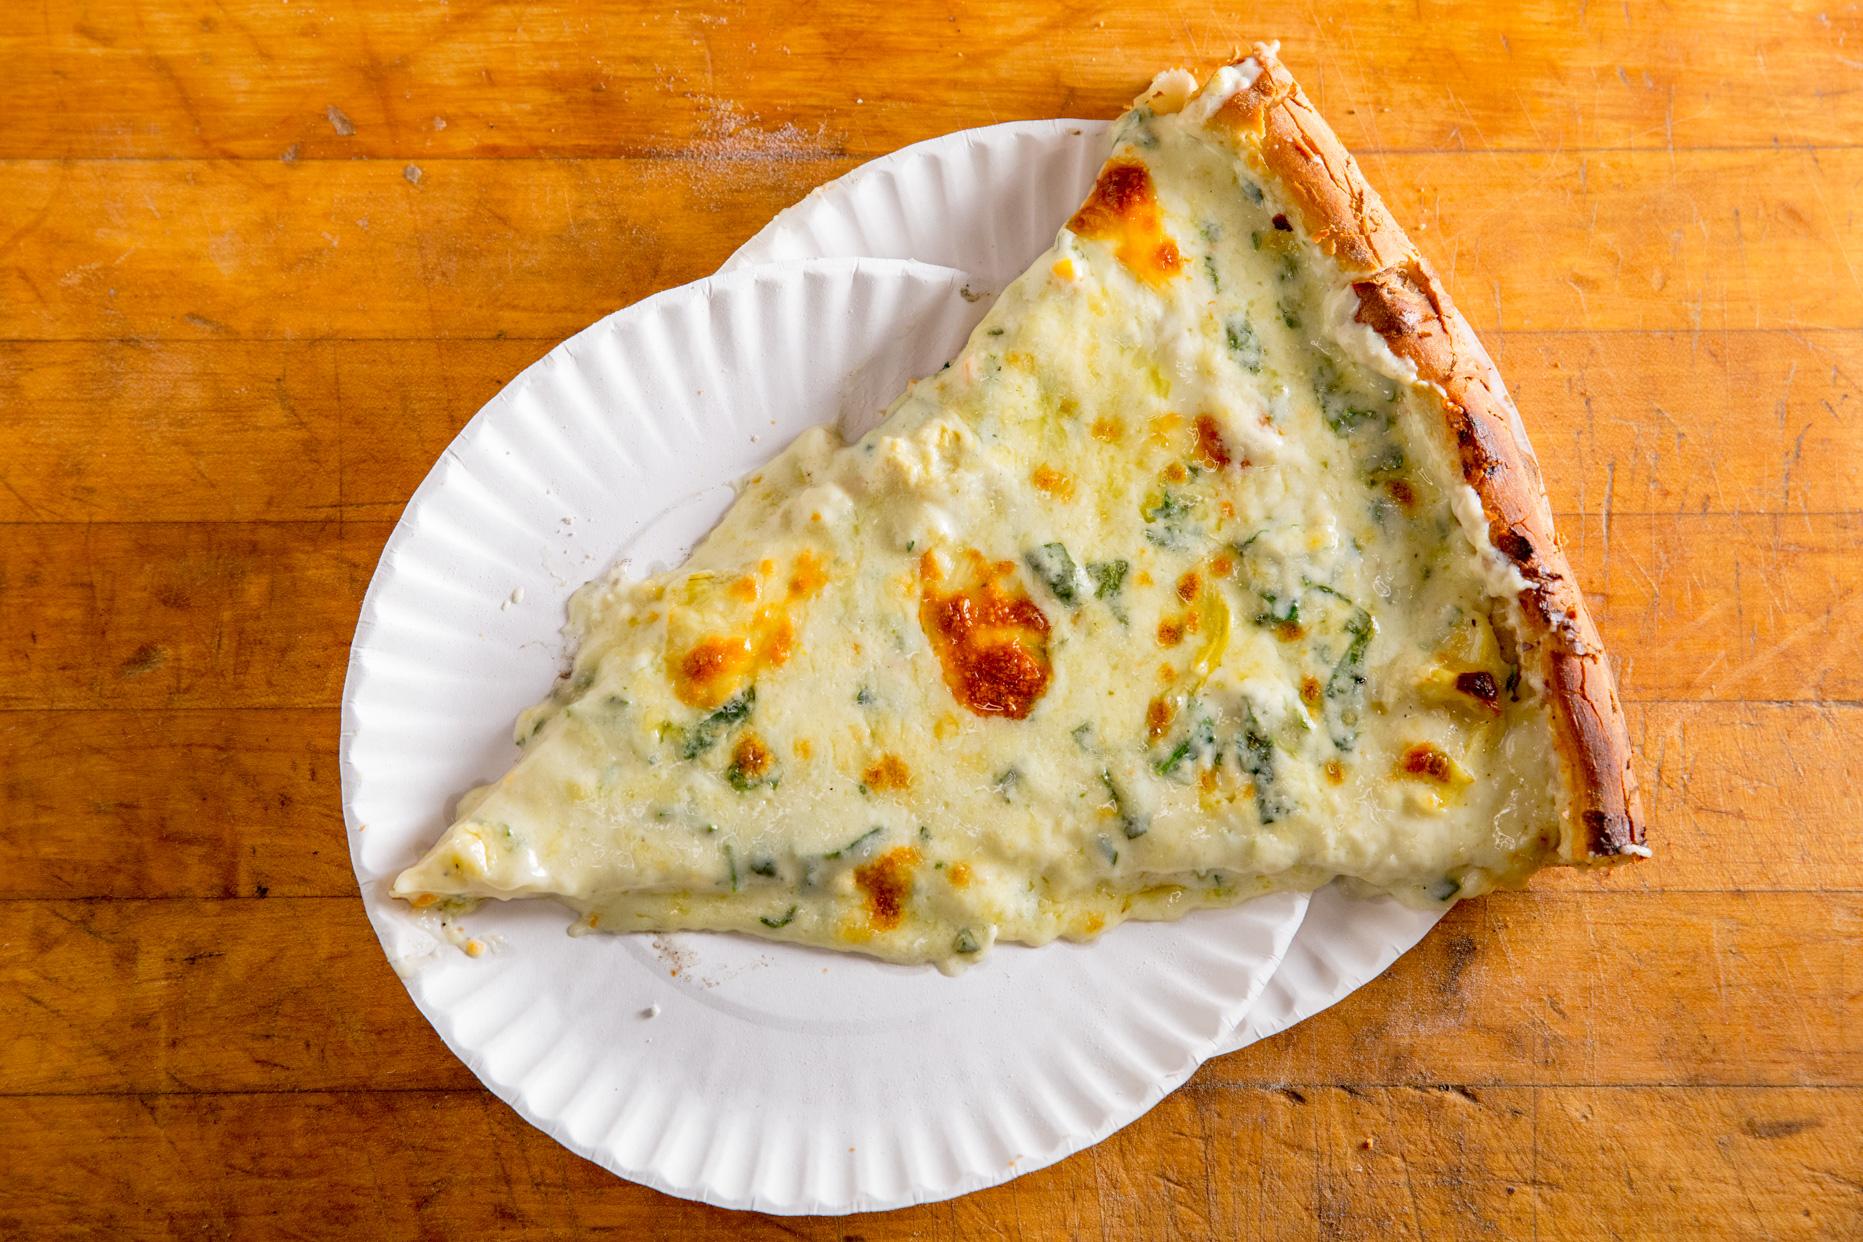 NY Slice Shop Artichoke Basille's Arrives in Oakland